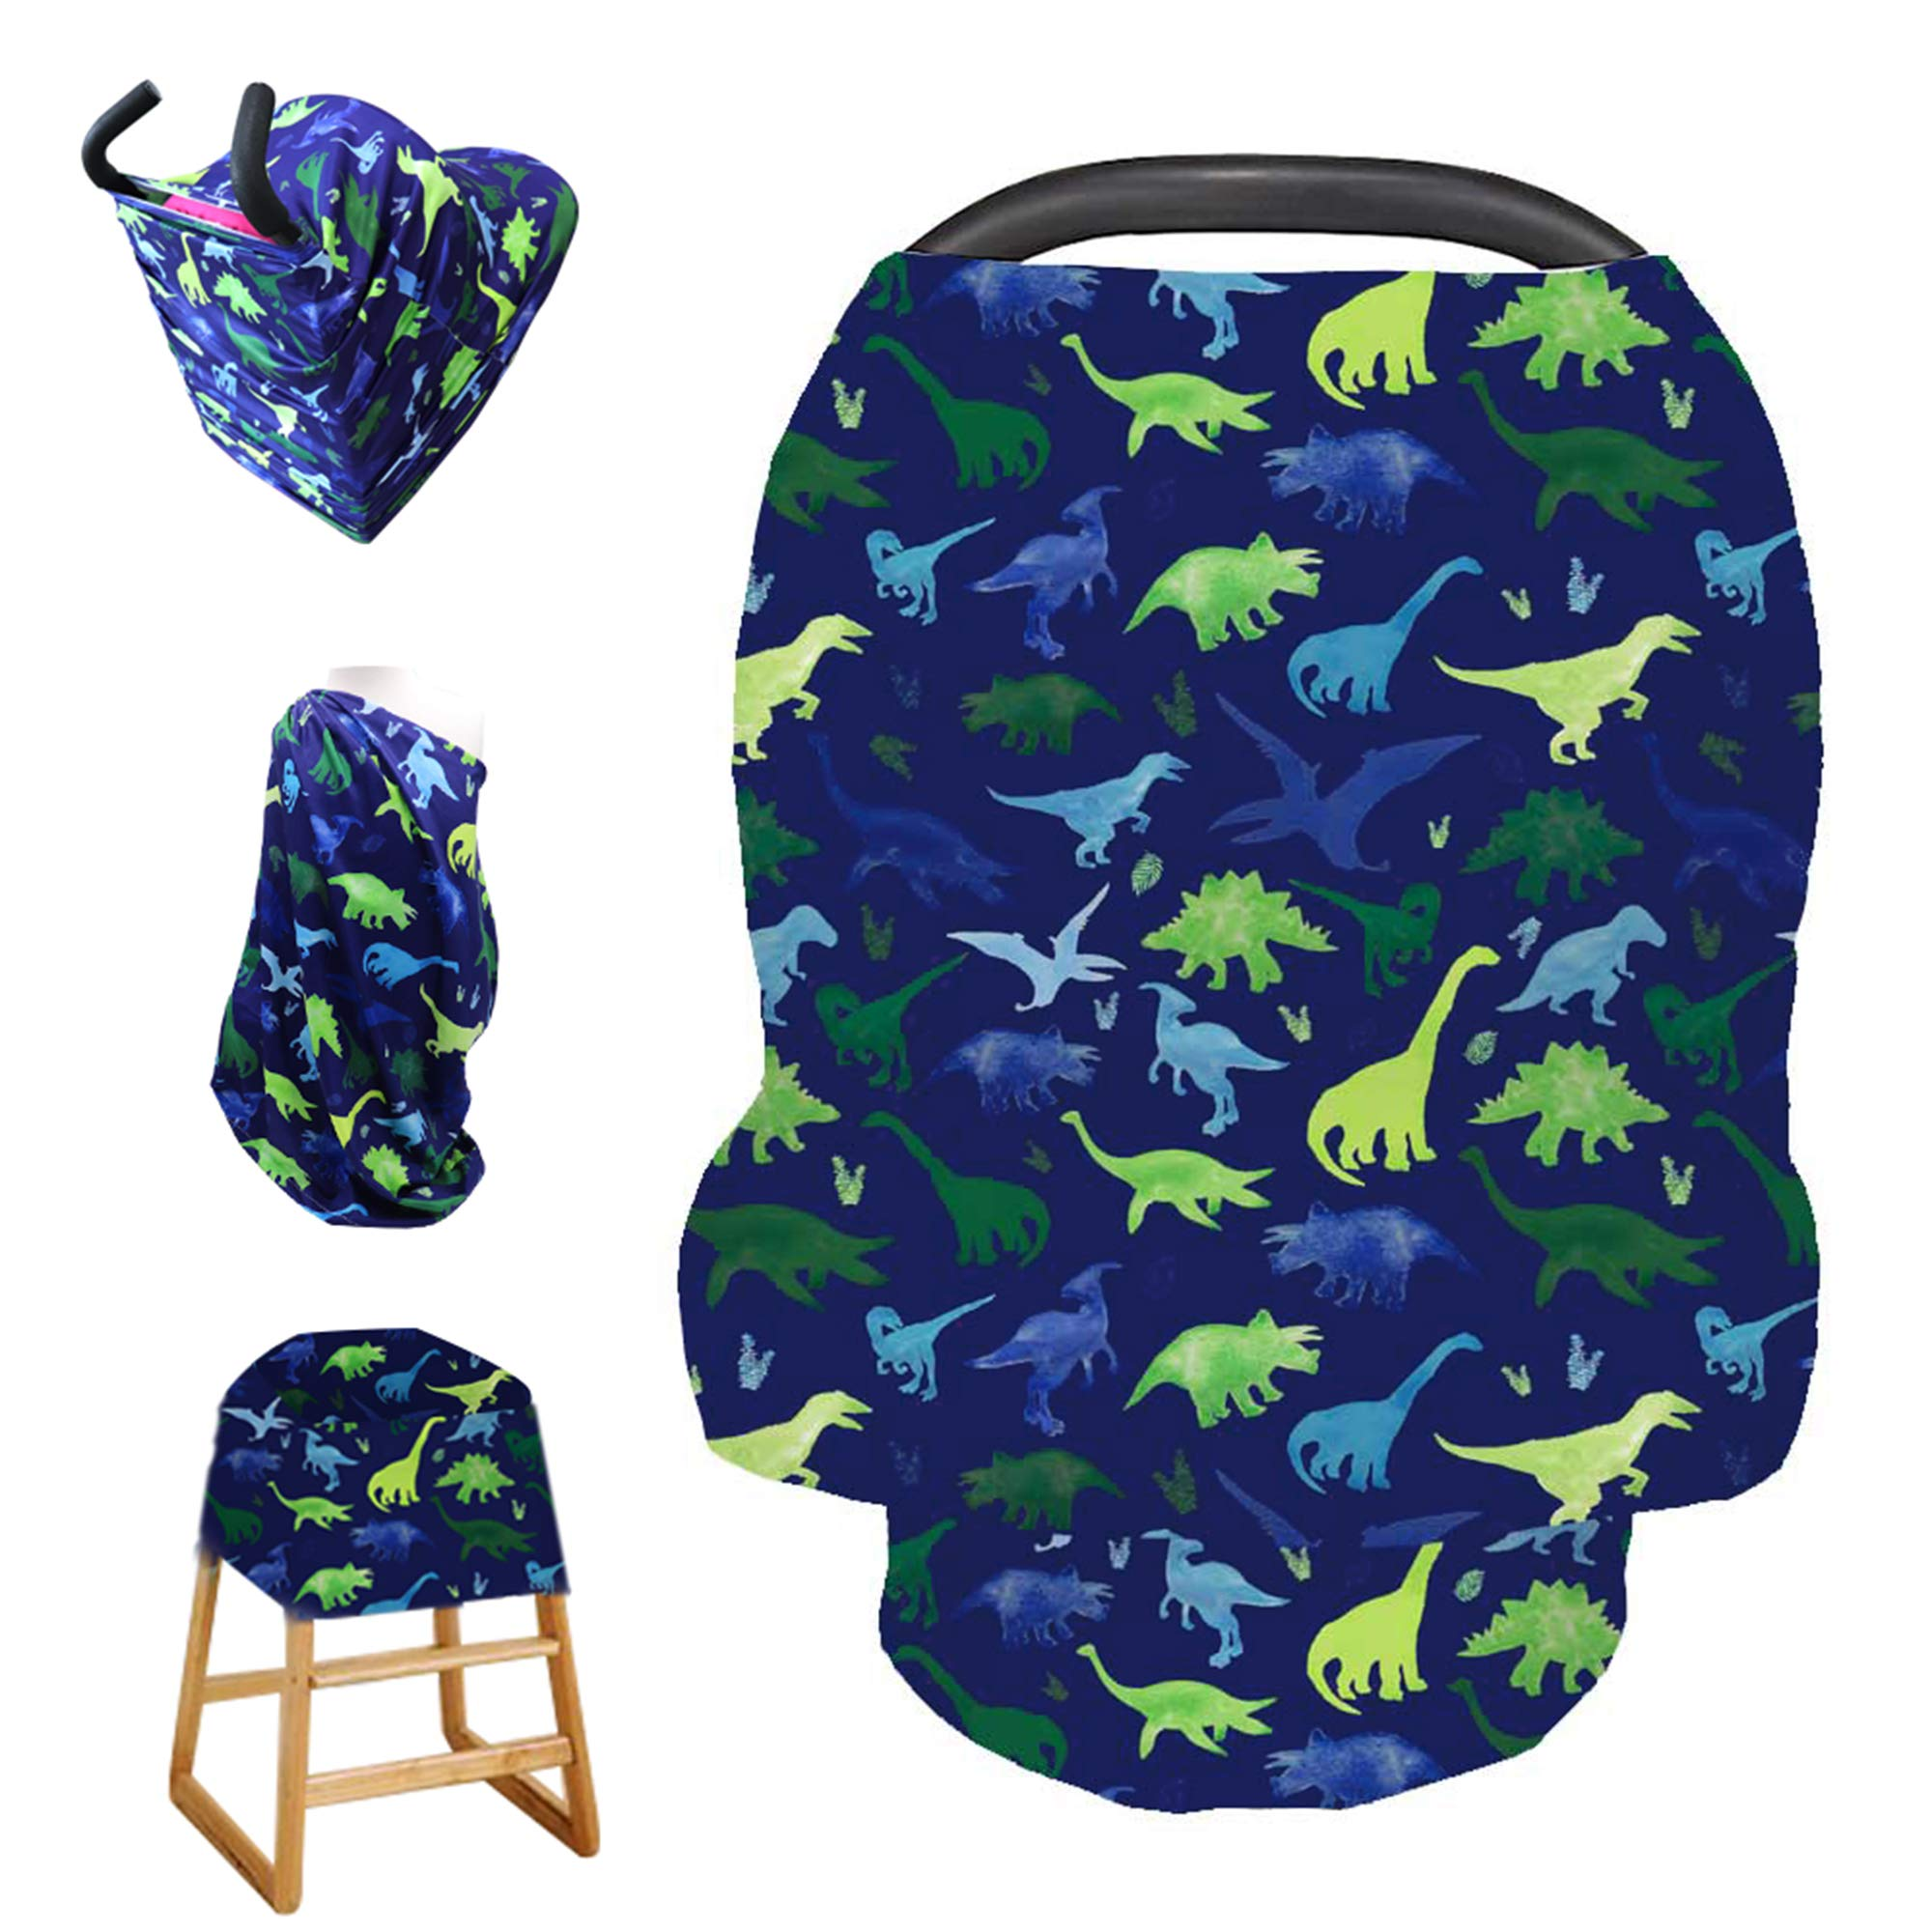 Baby Car Seat Cover Extra Large Unisex Nursing Fine Shade Infant Girl Boy Canopy